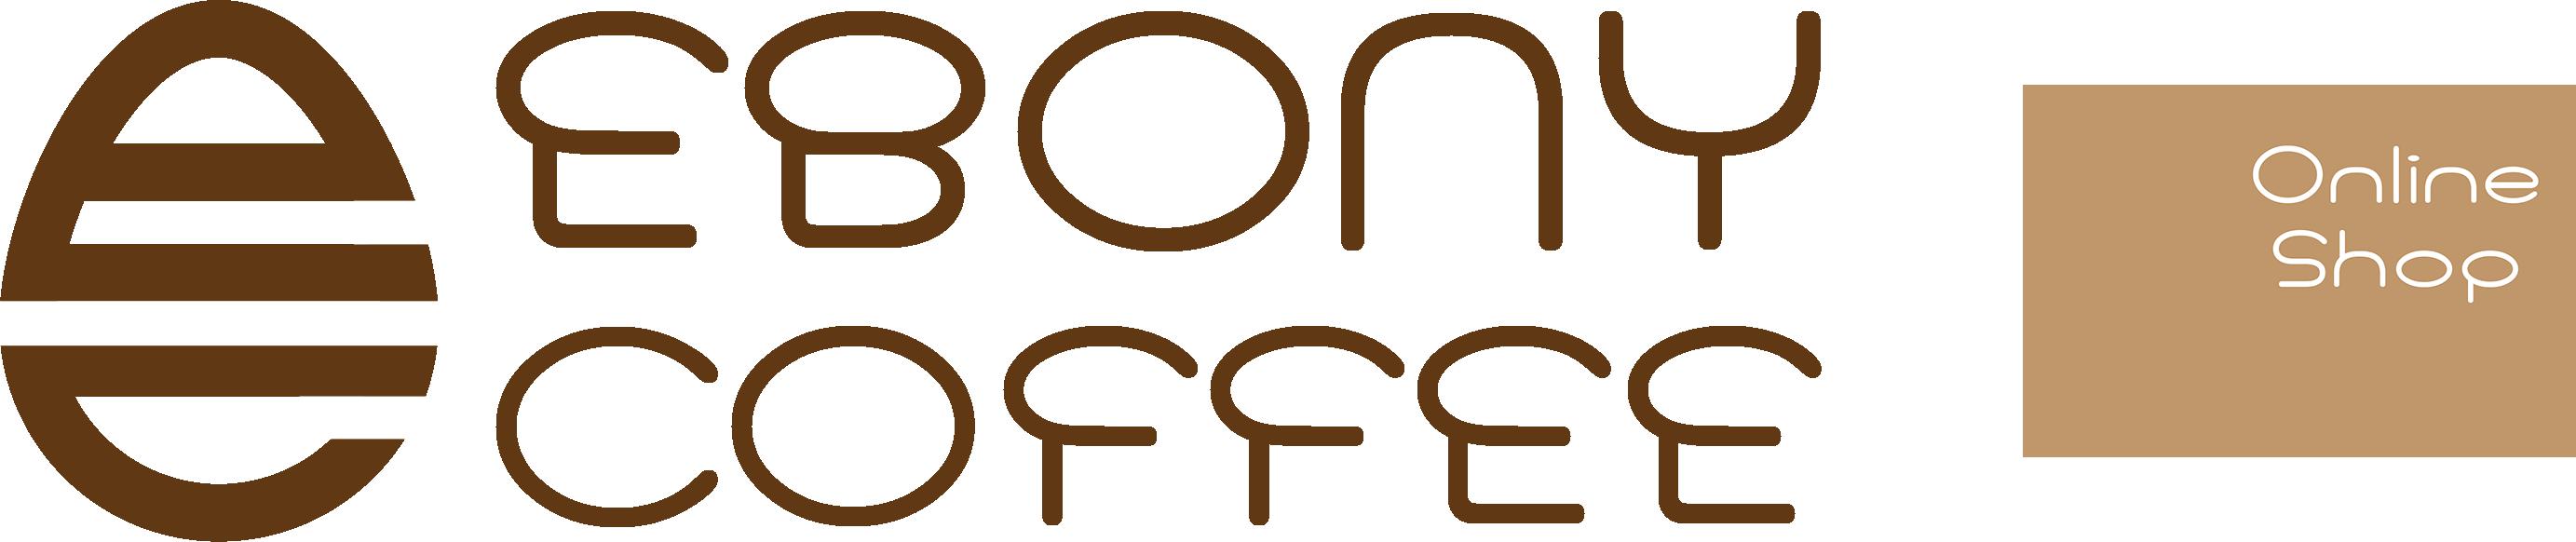 Online Shop - EBONY COFFEE